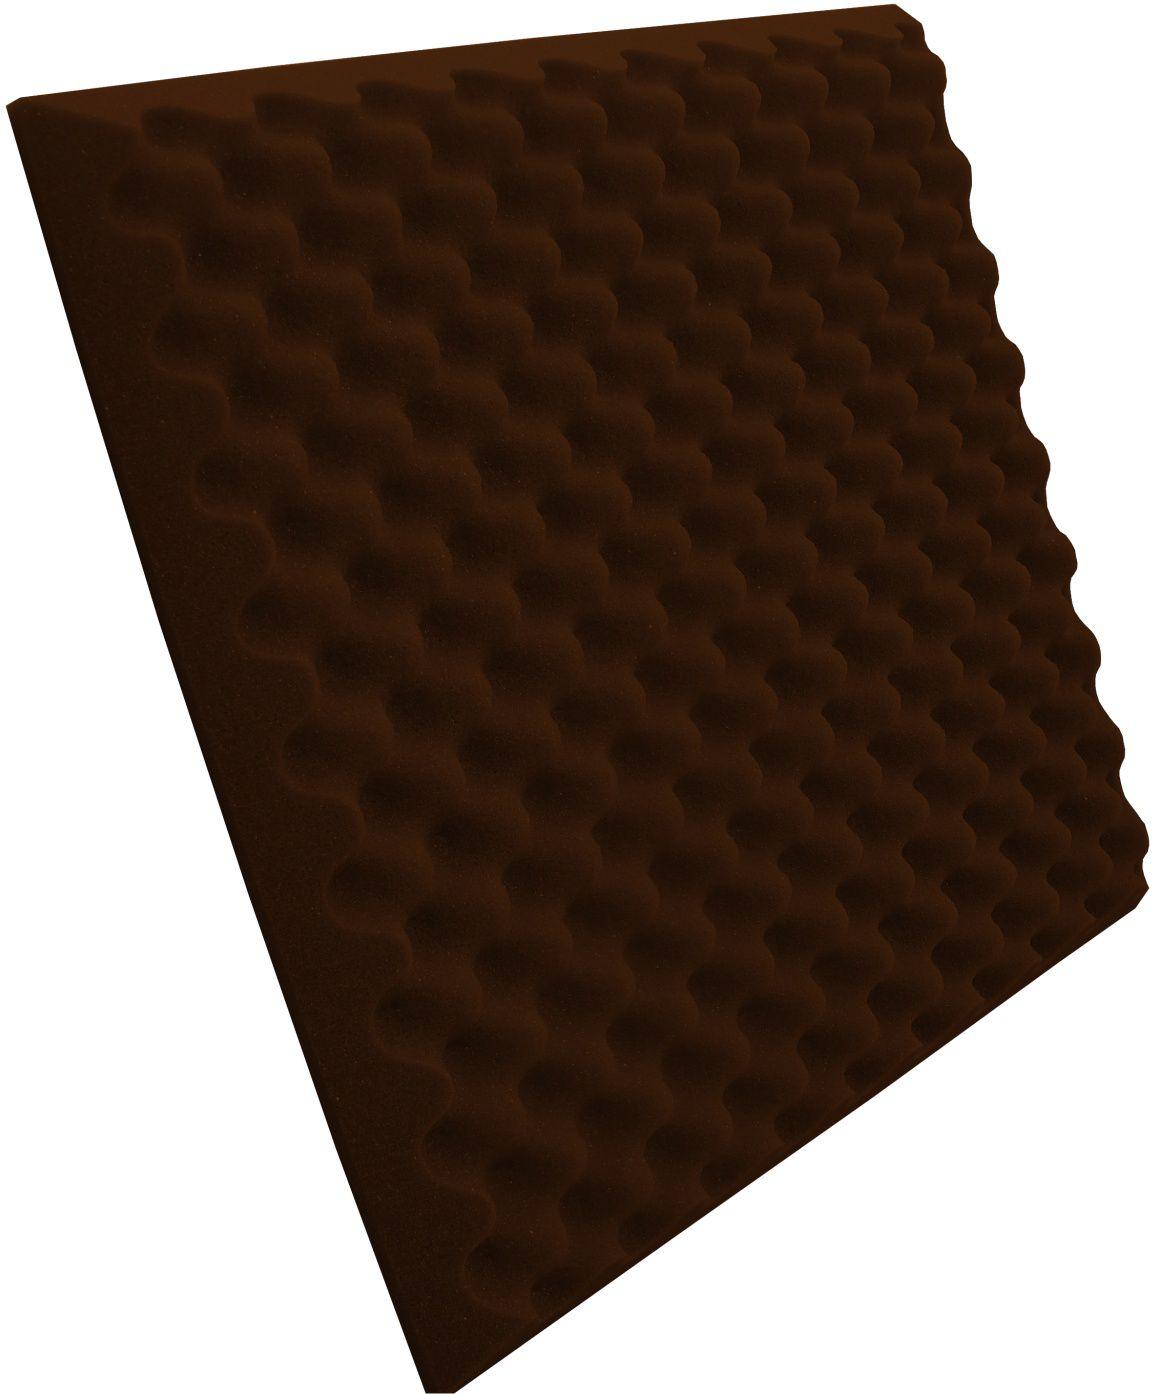 Espuma Perfilada - Kit 8 - Marrom - 50mm (2m²)  - Loja SPL Acústica